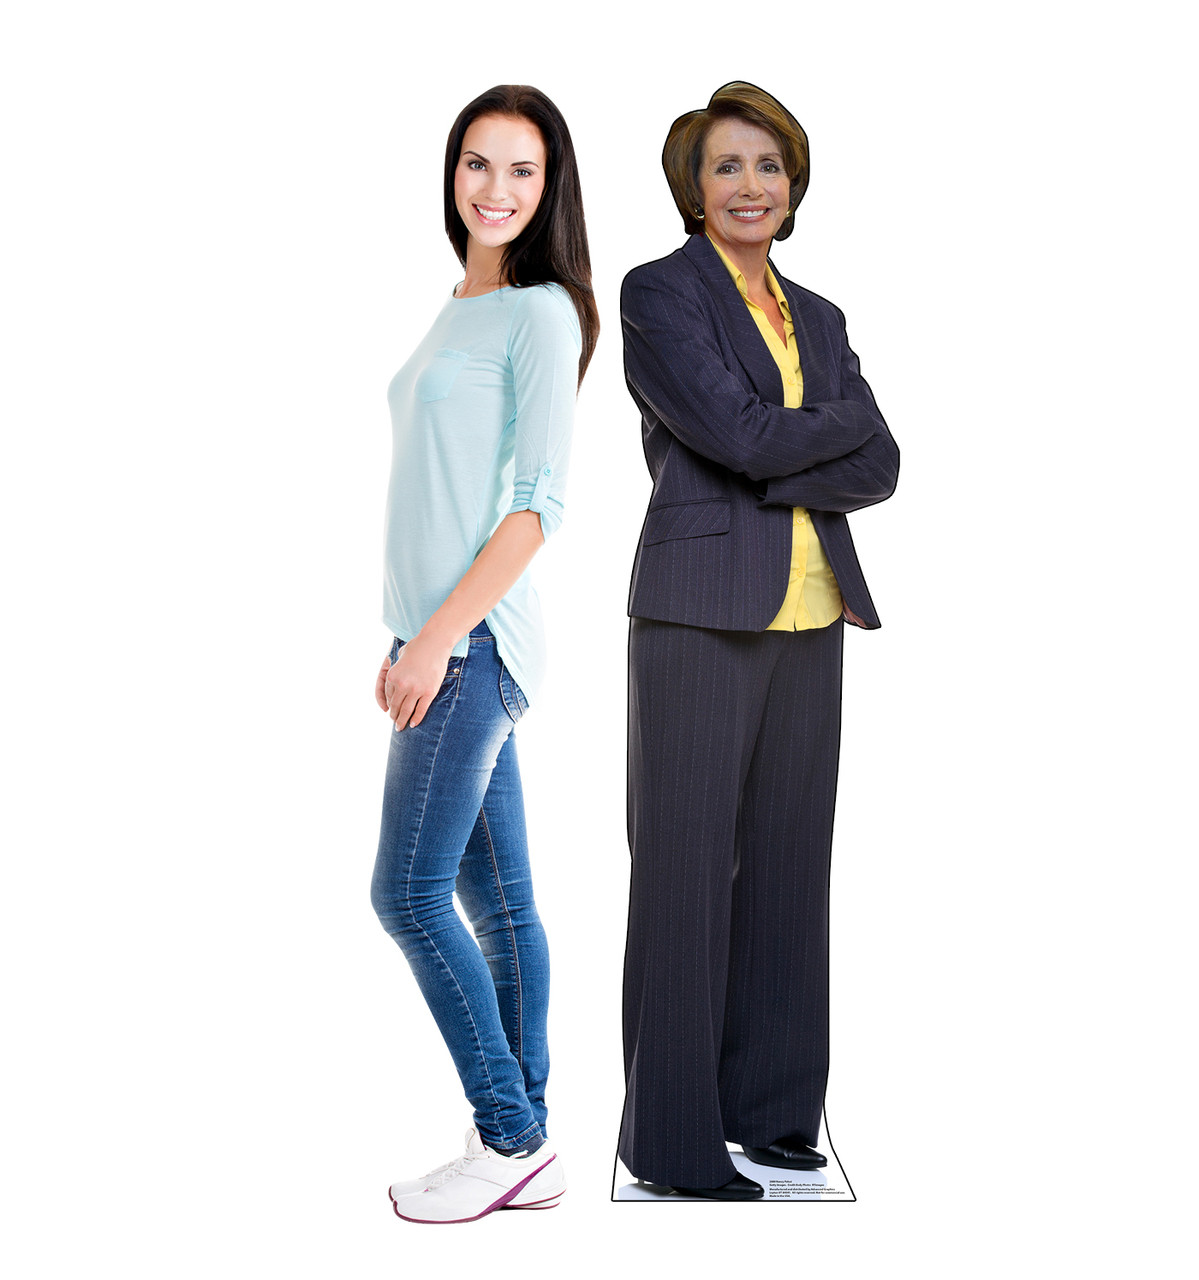 Life-size cardboard standee of Nancy Pelosi with model.